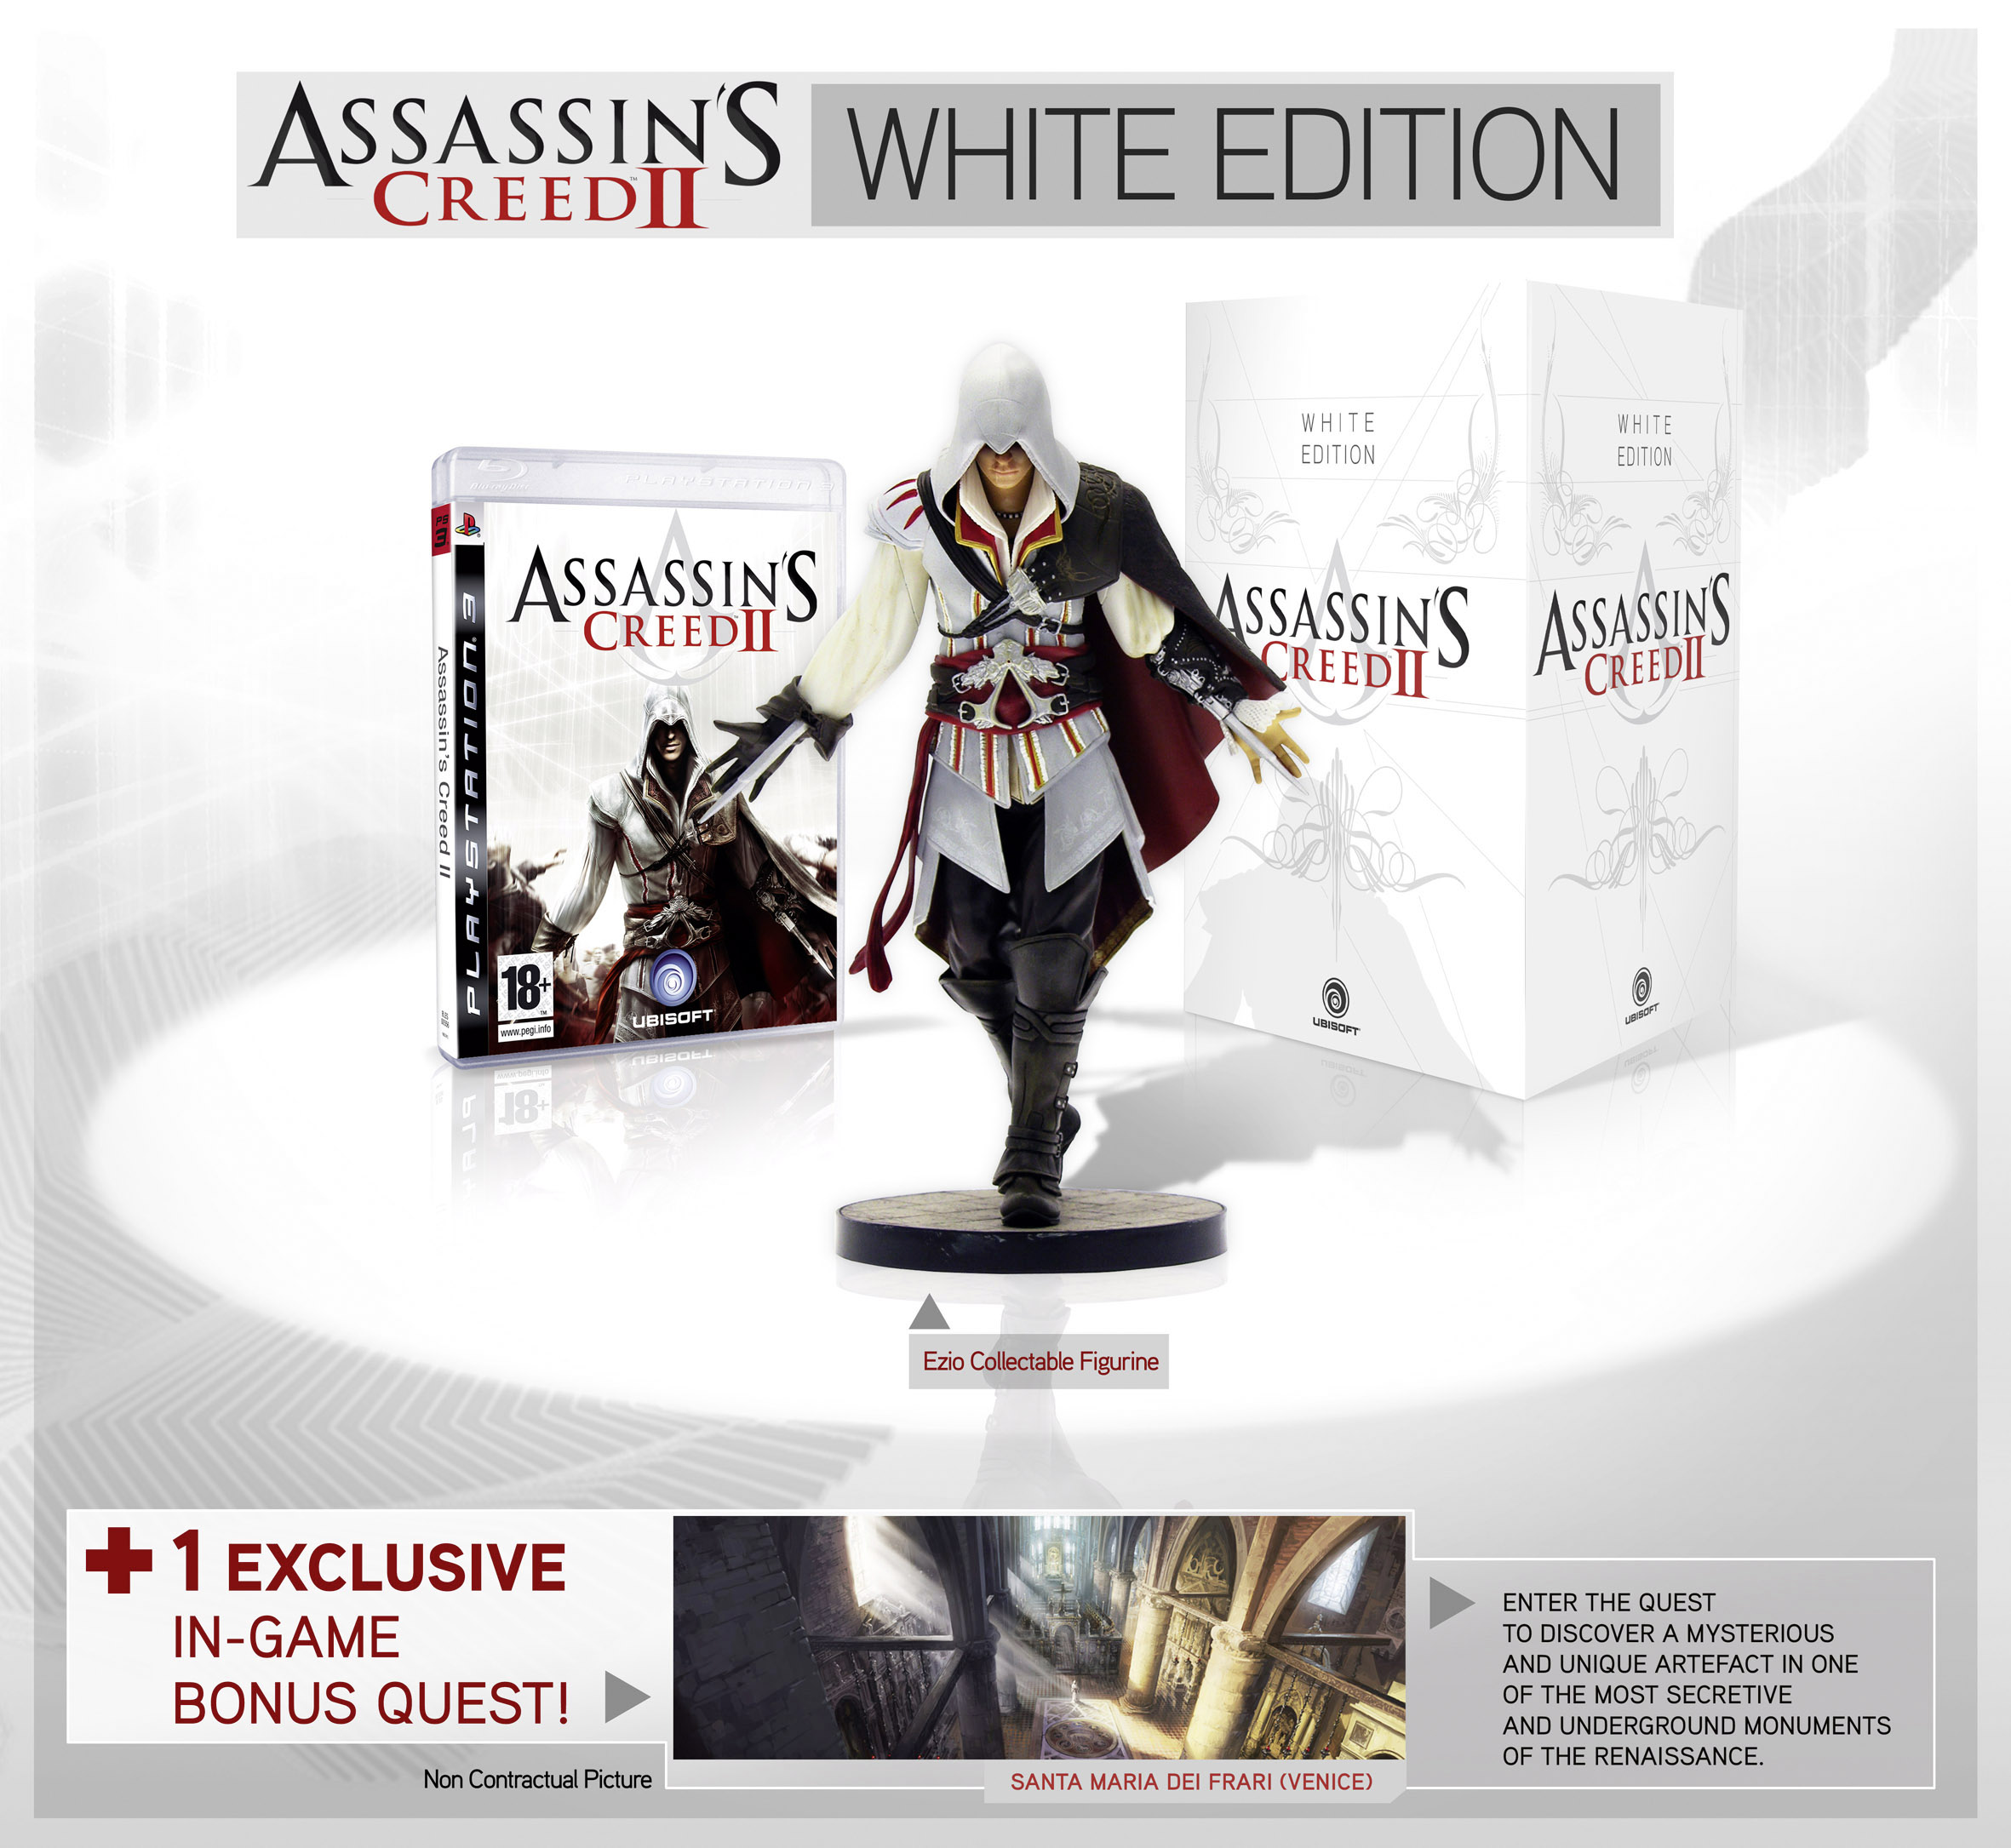 Assassinscreed2 collectorwhite